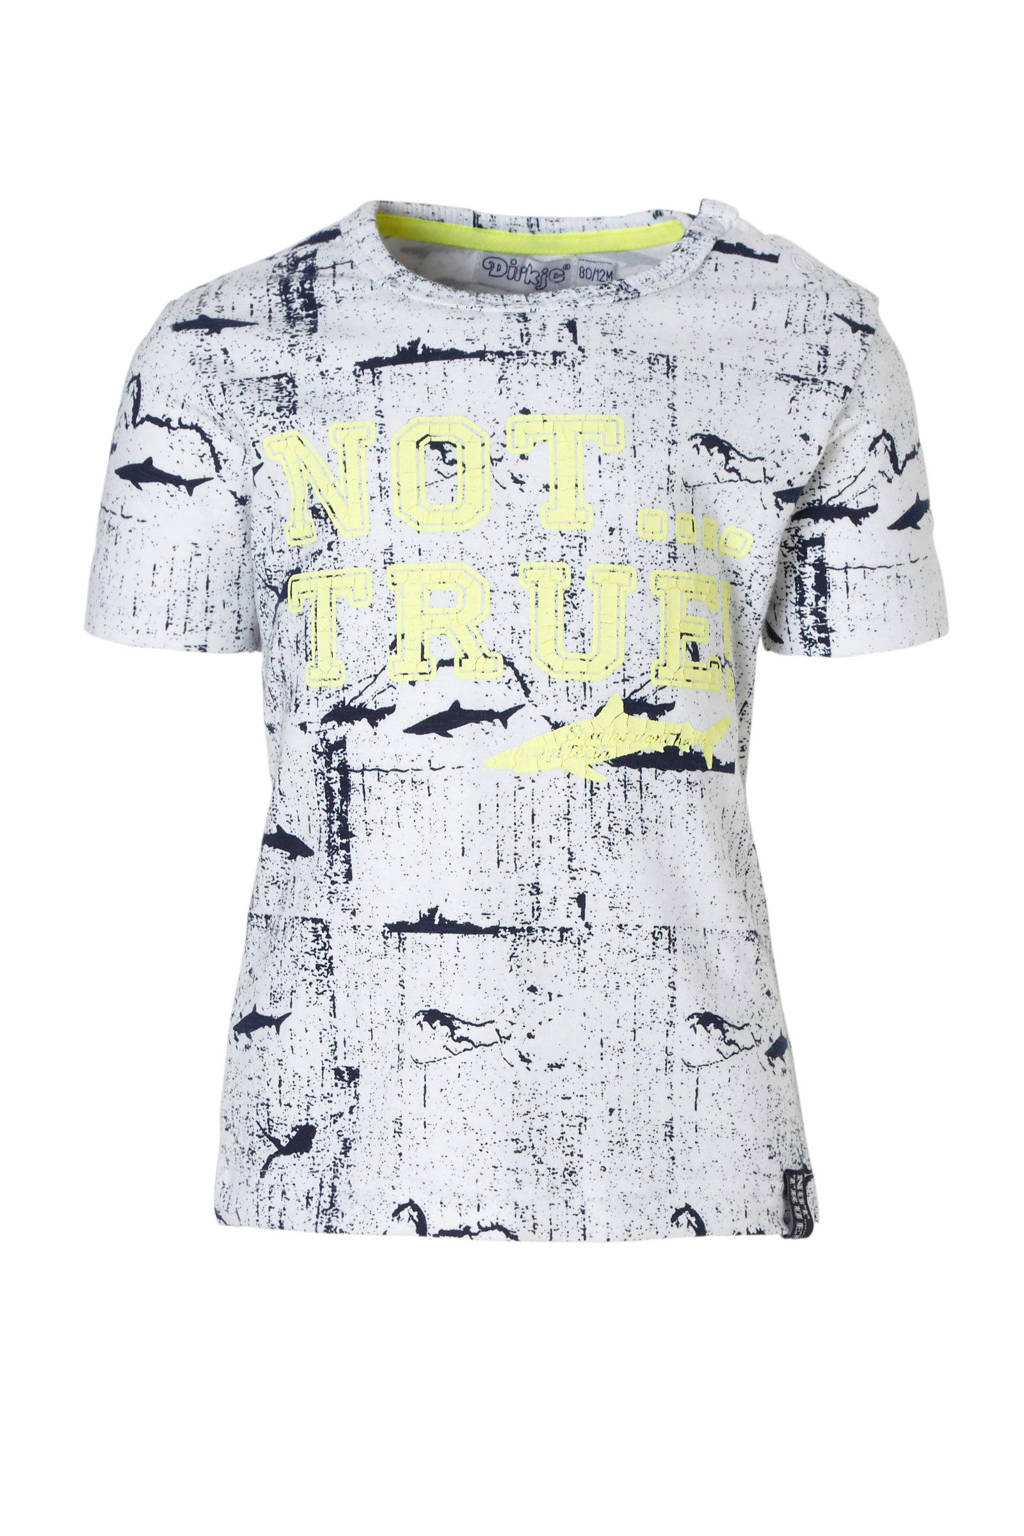 Dirkje T-shirt met tekst, marine/ wit